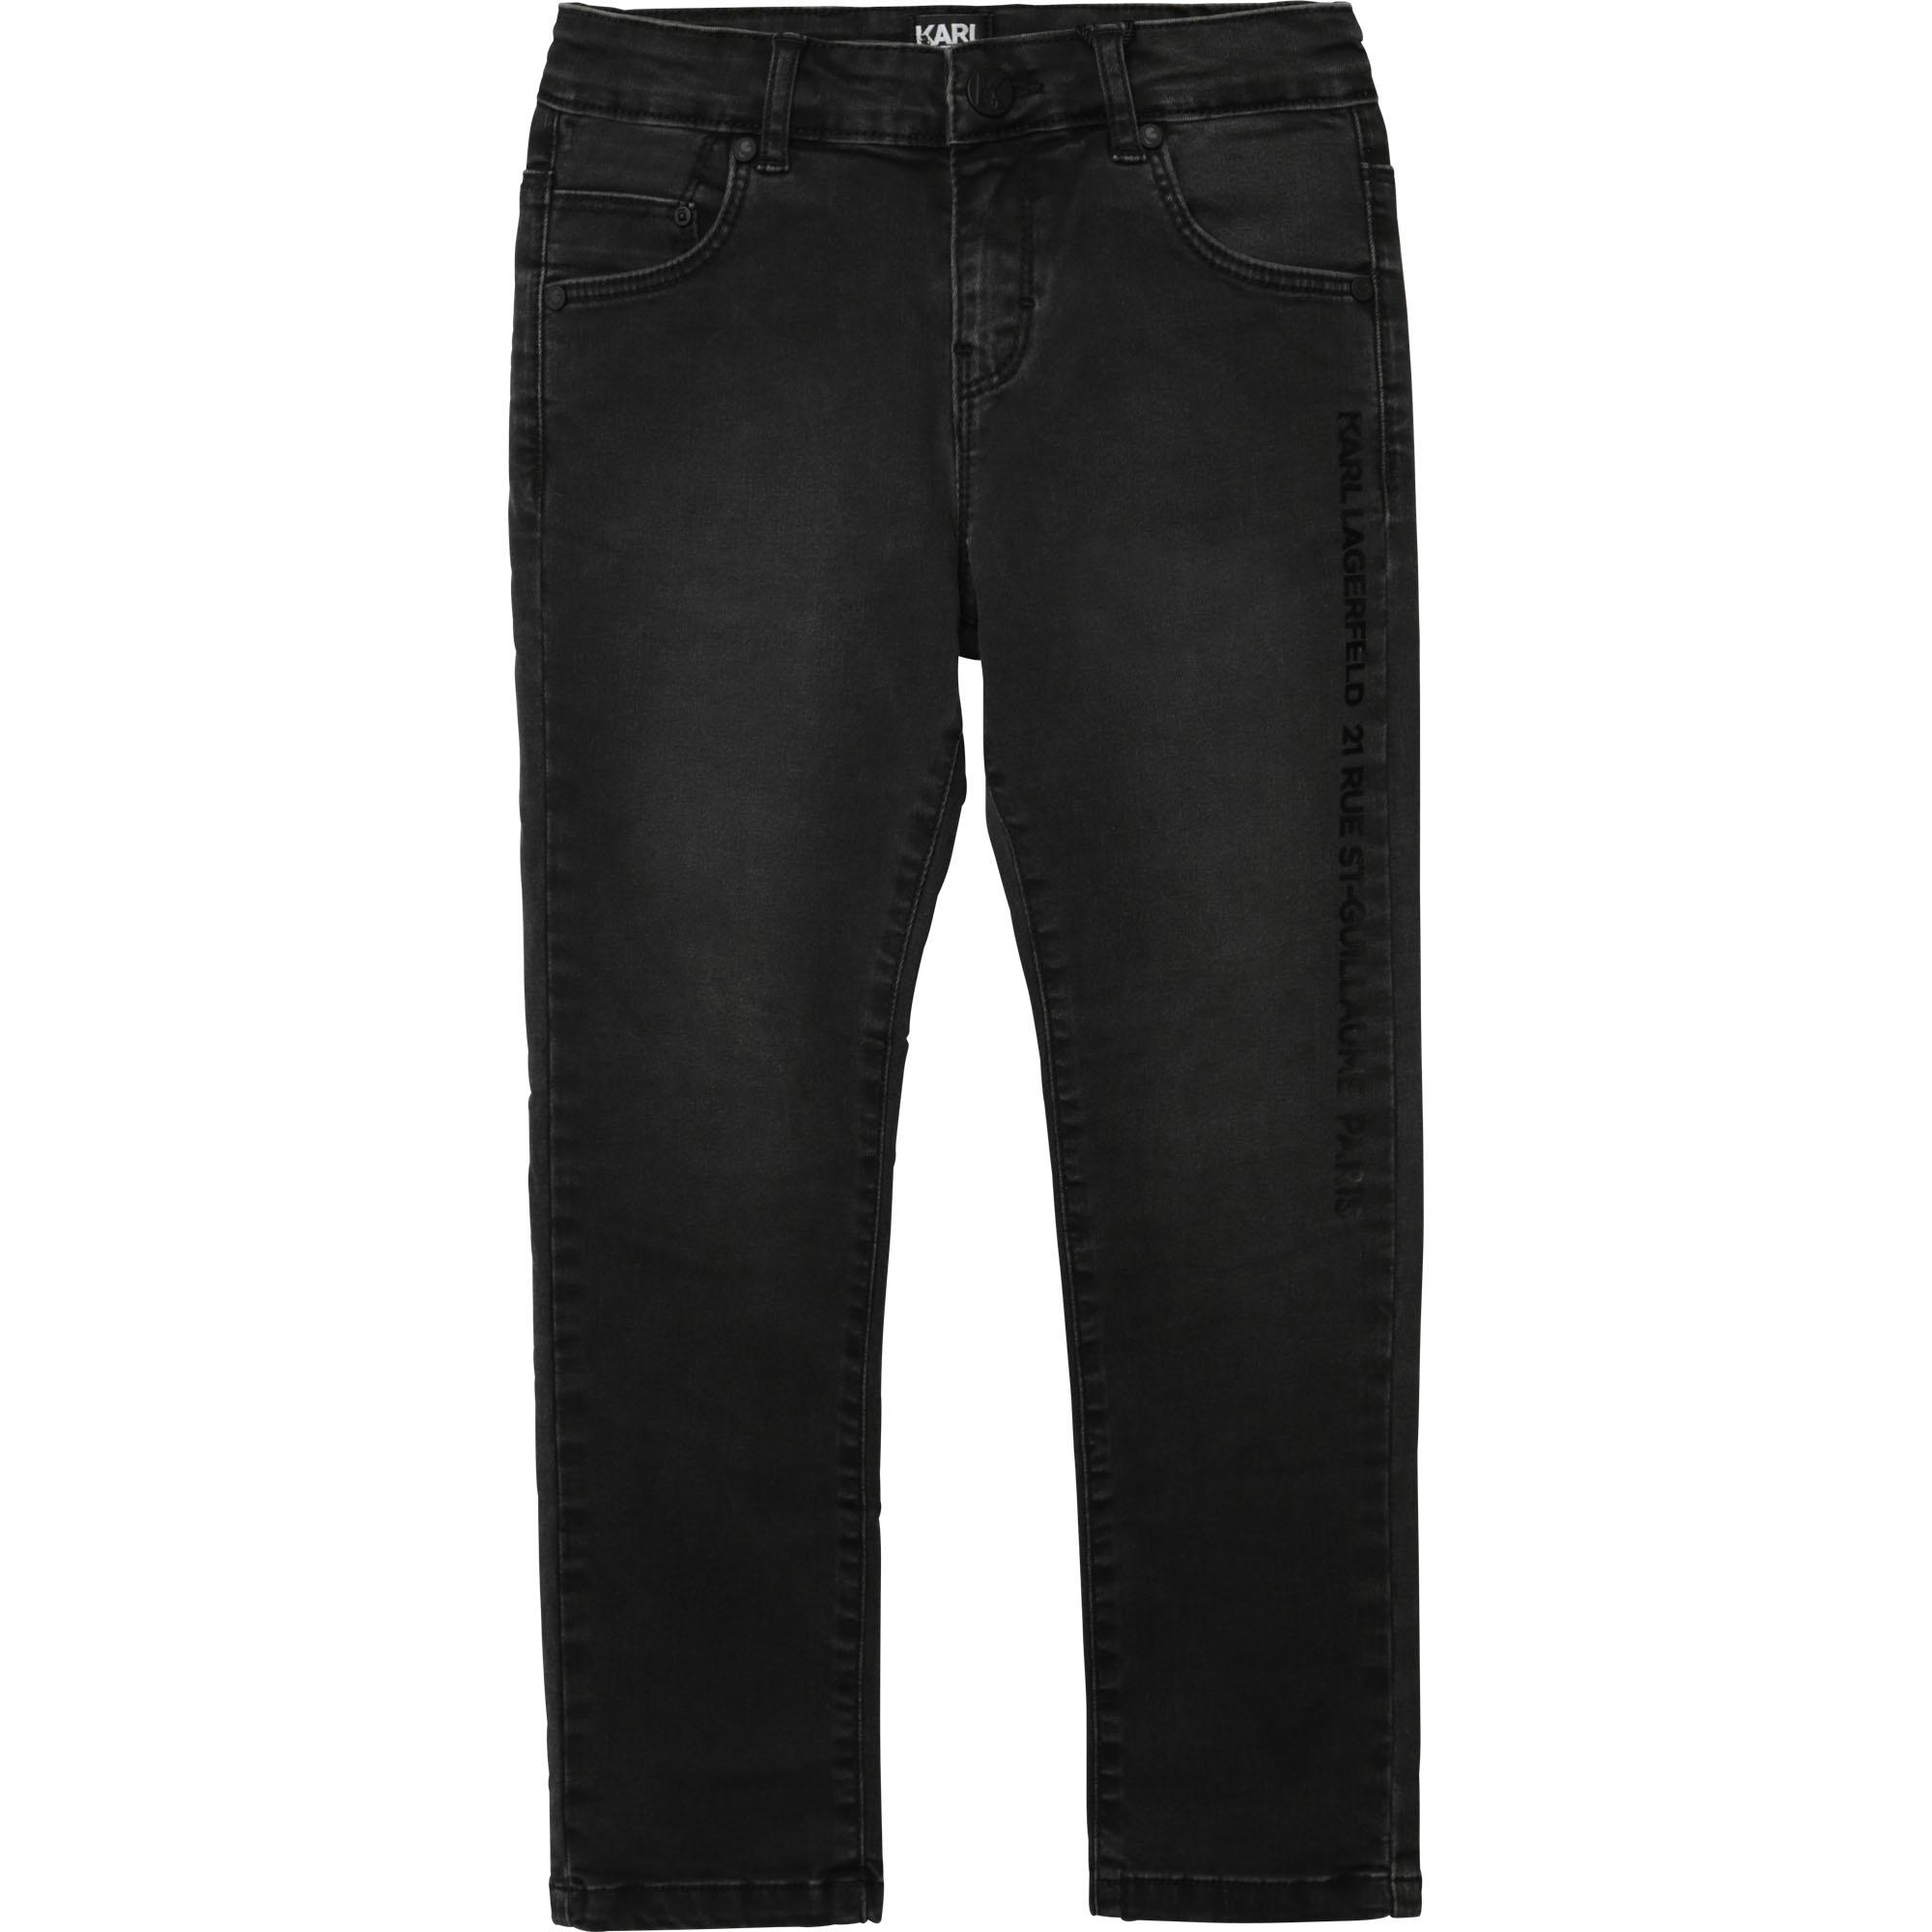 KARL LAGERFELD jeans uni en coton extensible-1